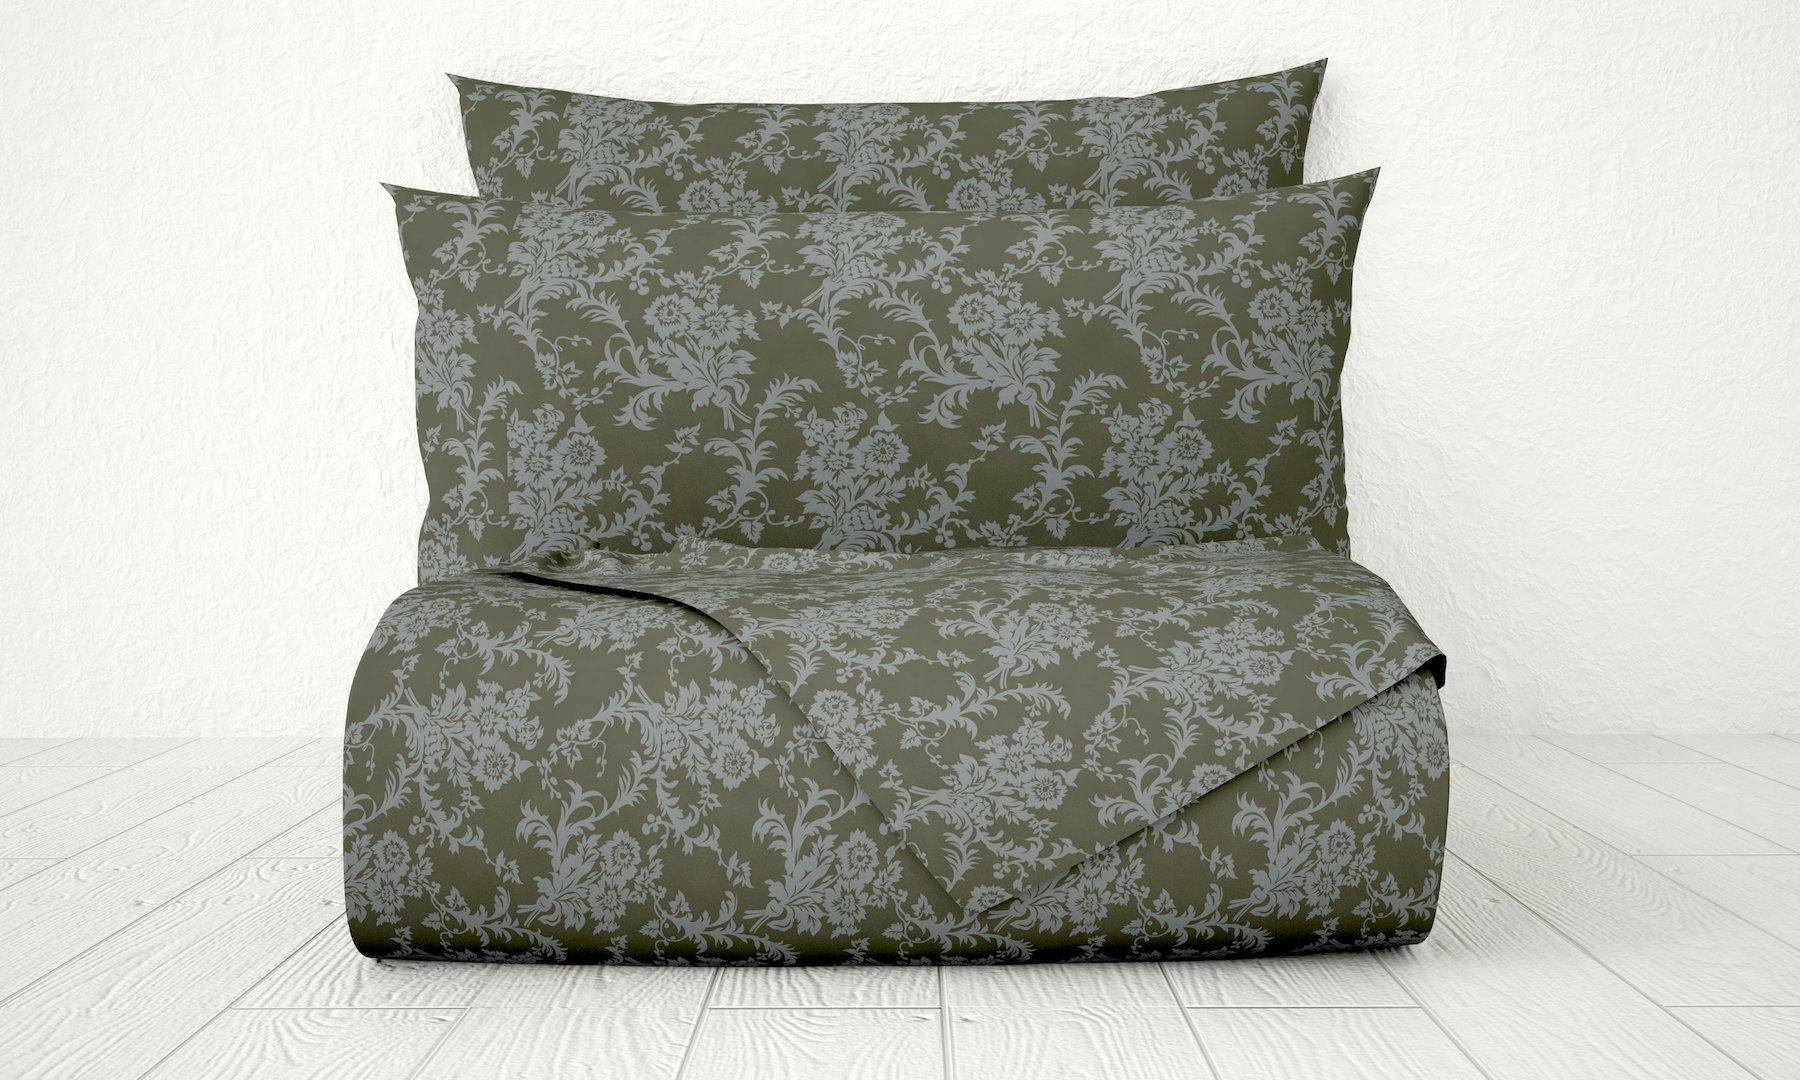 Livingston Home Xara Luxury 33234 4 Piece Damask 1800 Series Printed Cotton Essential Embossed Tone on Tone Bed Sheet Set, Full, Dark Grey